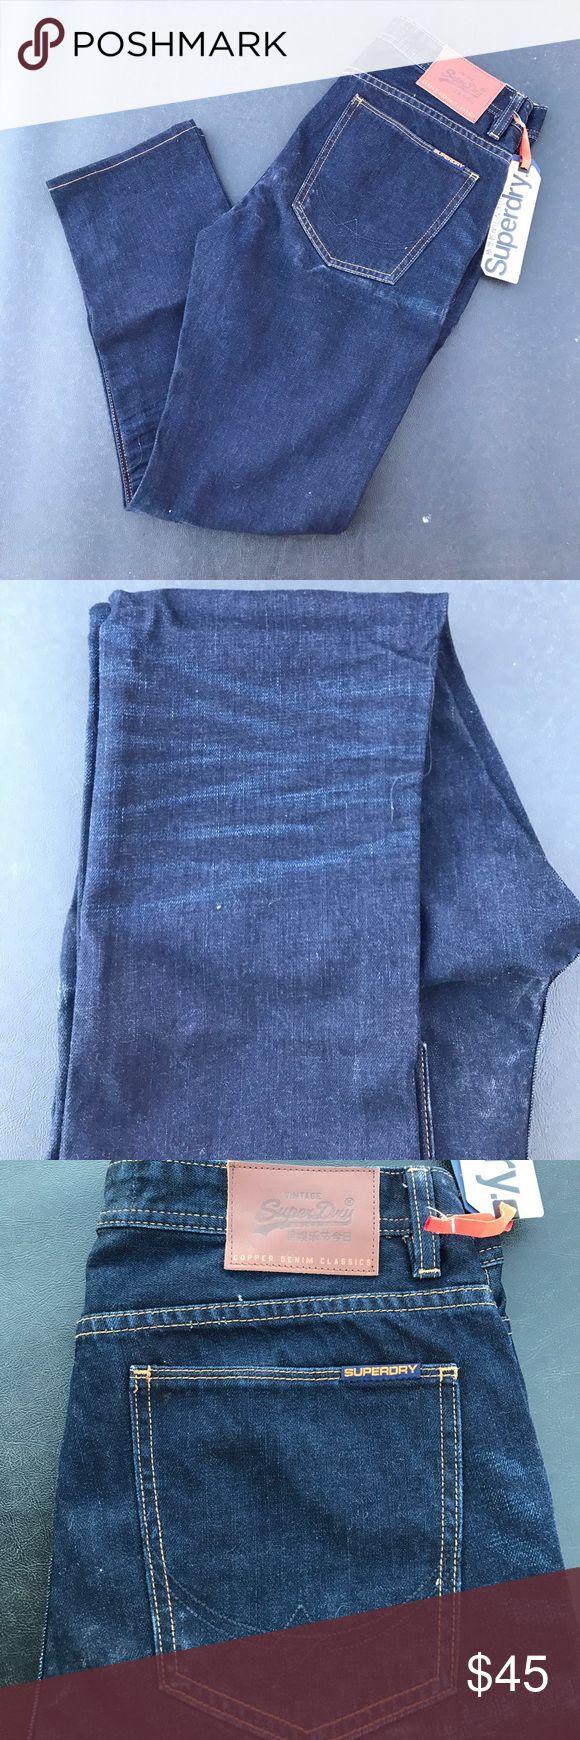 Superdry copper slim denim size 32w 32L Super dry copper slim denim size 32w 32L Superdry Jeans Slim